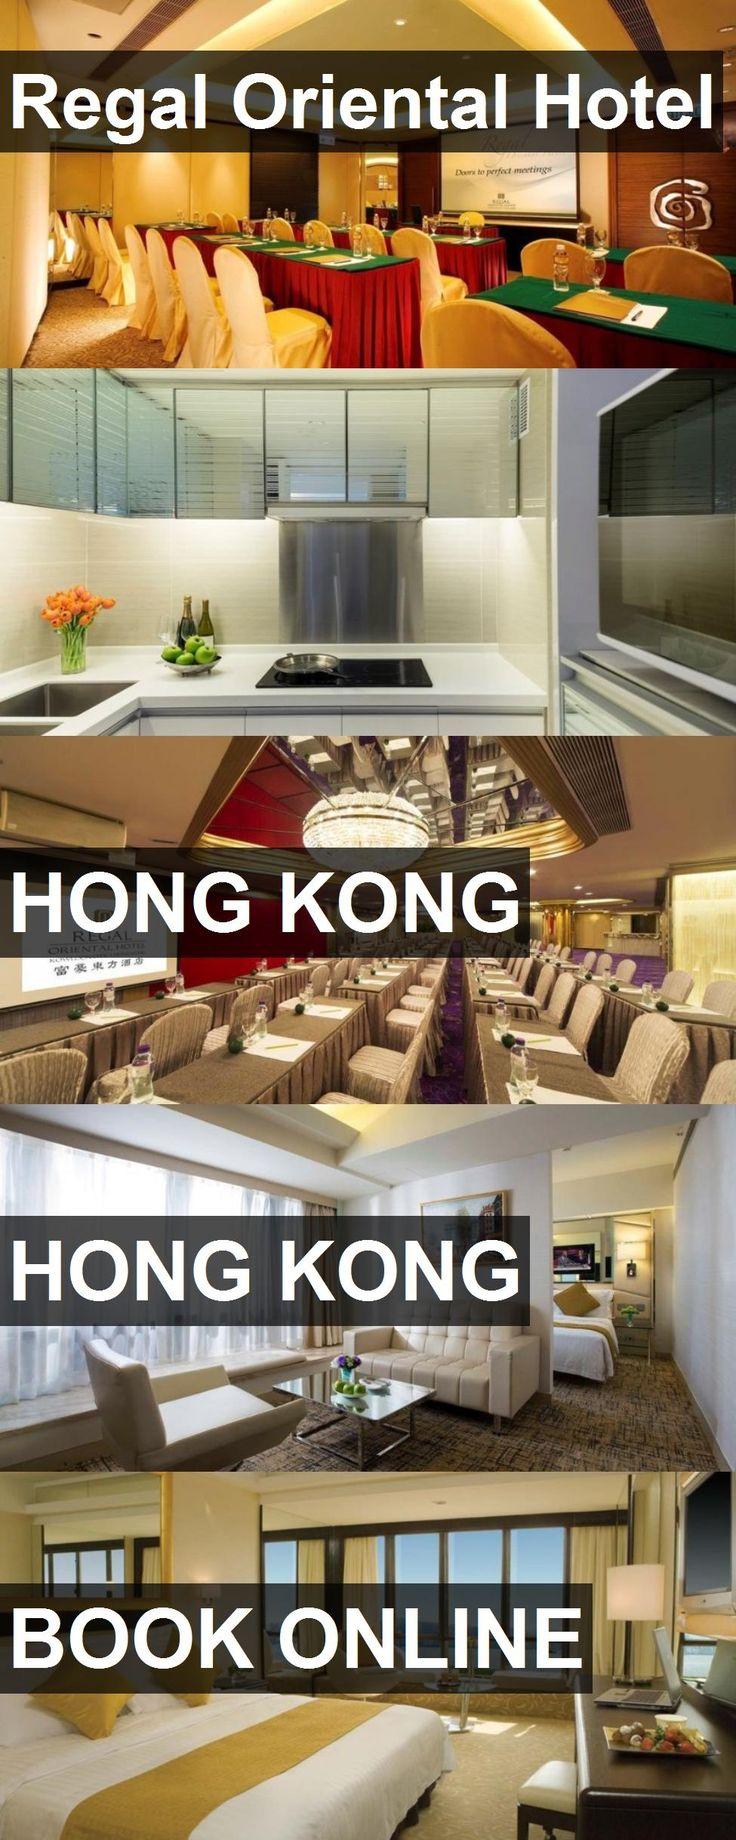 Regal Oriental Hotel in Hong Kong, Hong Kong. For more information, photos, reviews and best prices please follow the link. #HongKong #HongKong #travel #vacation #hotel